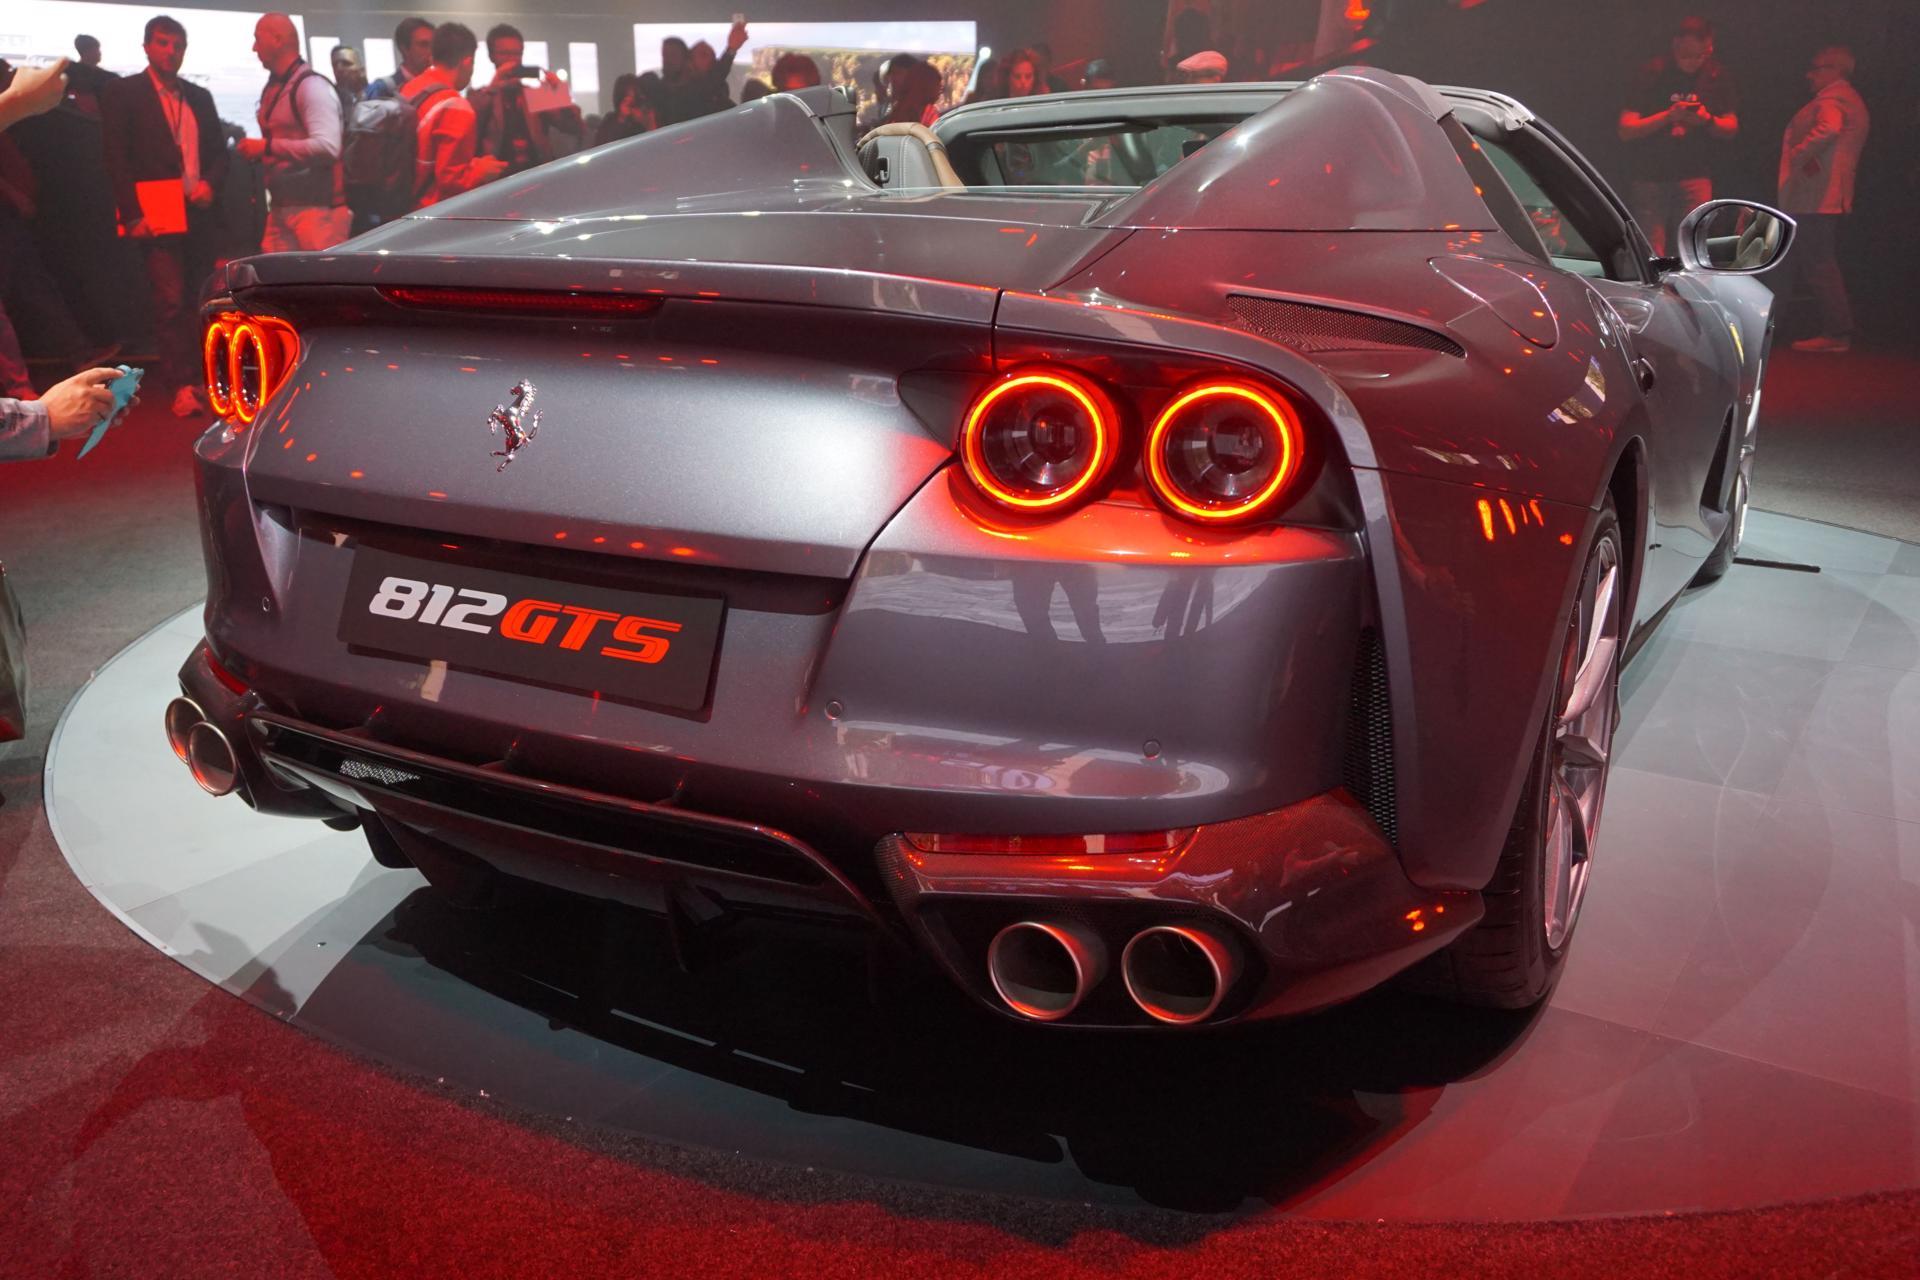 The 2020 Ferrari 812 Gts Is A 790 Horsepower Convertible Weapon